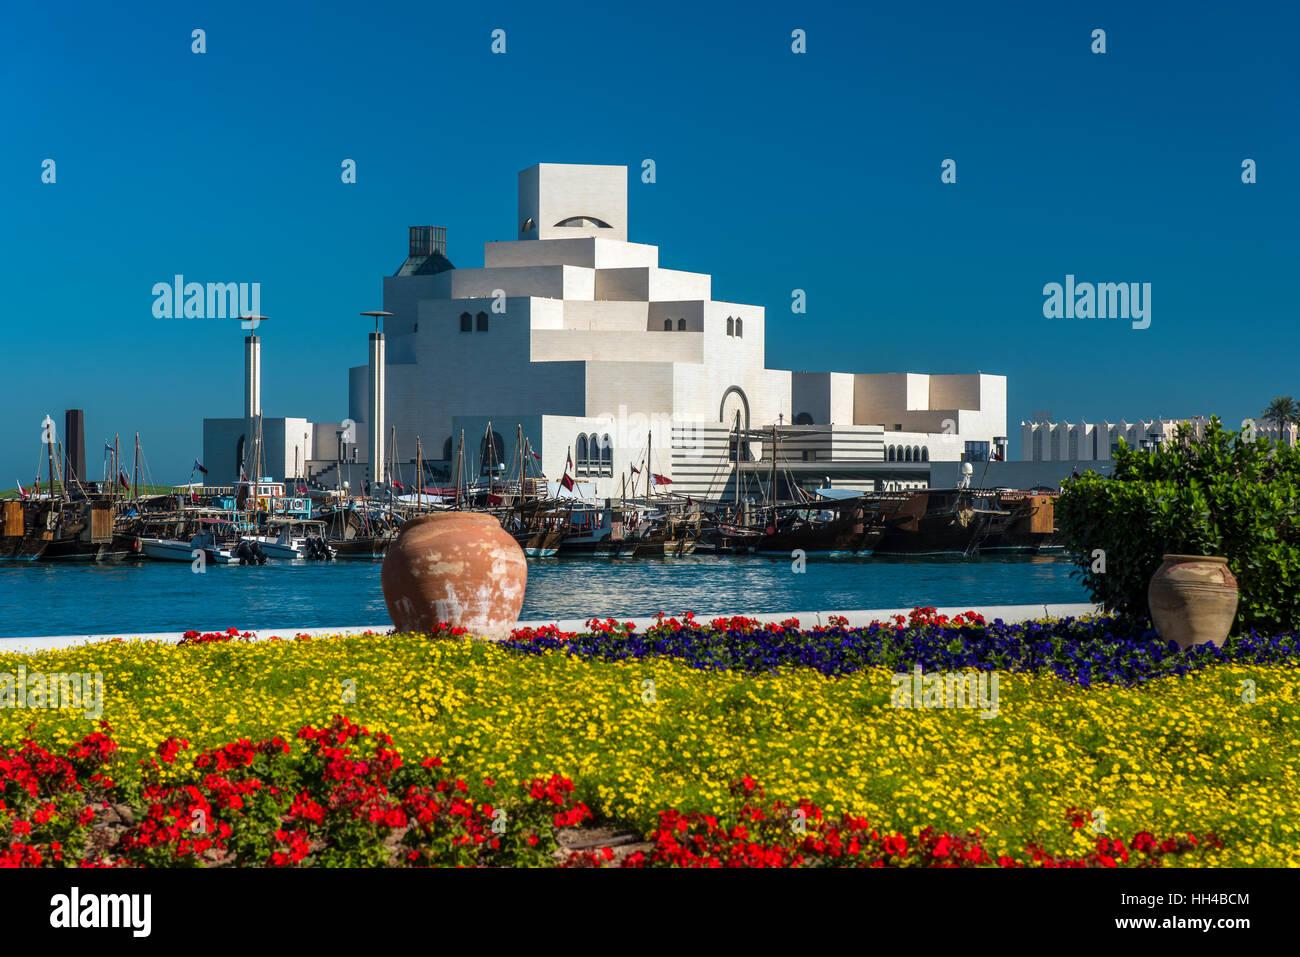 Museum of Islamic Art, Doha, Qatar - Stock Image